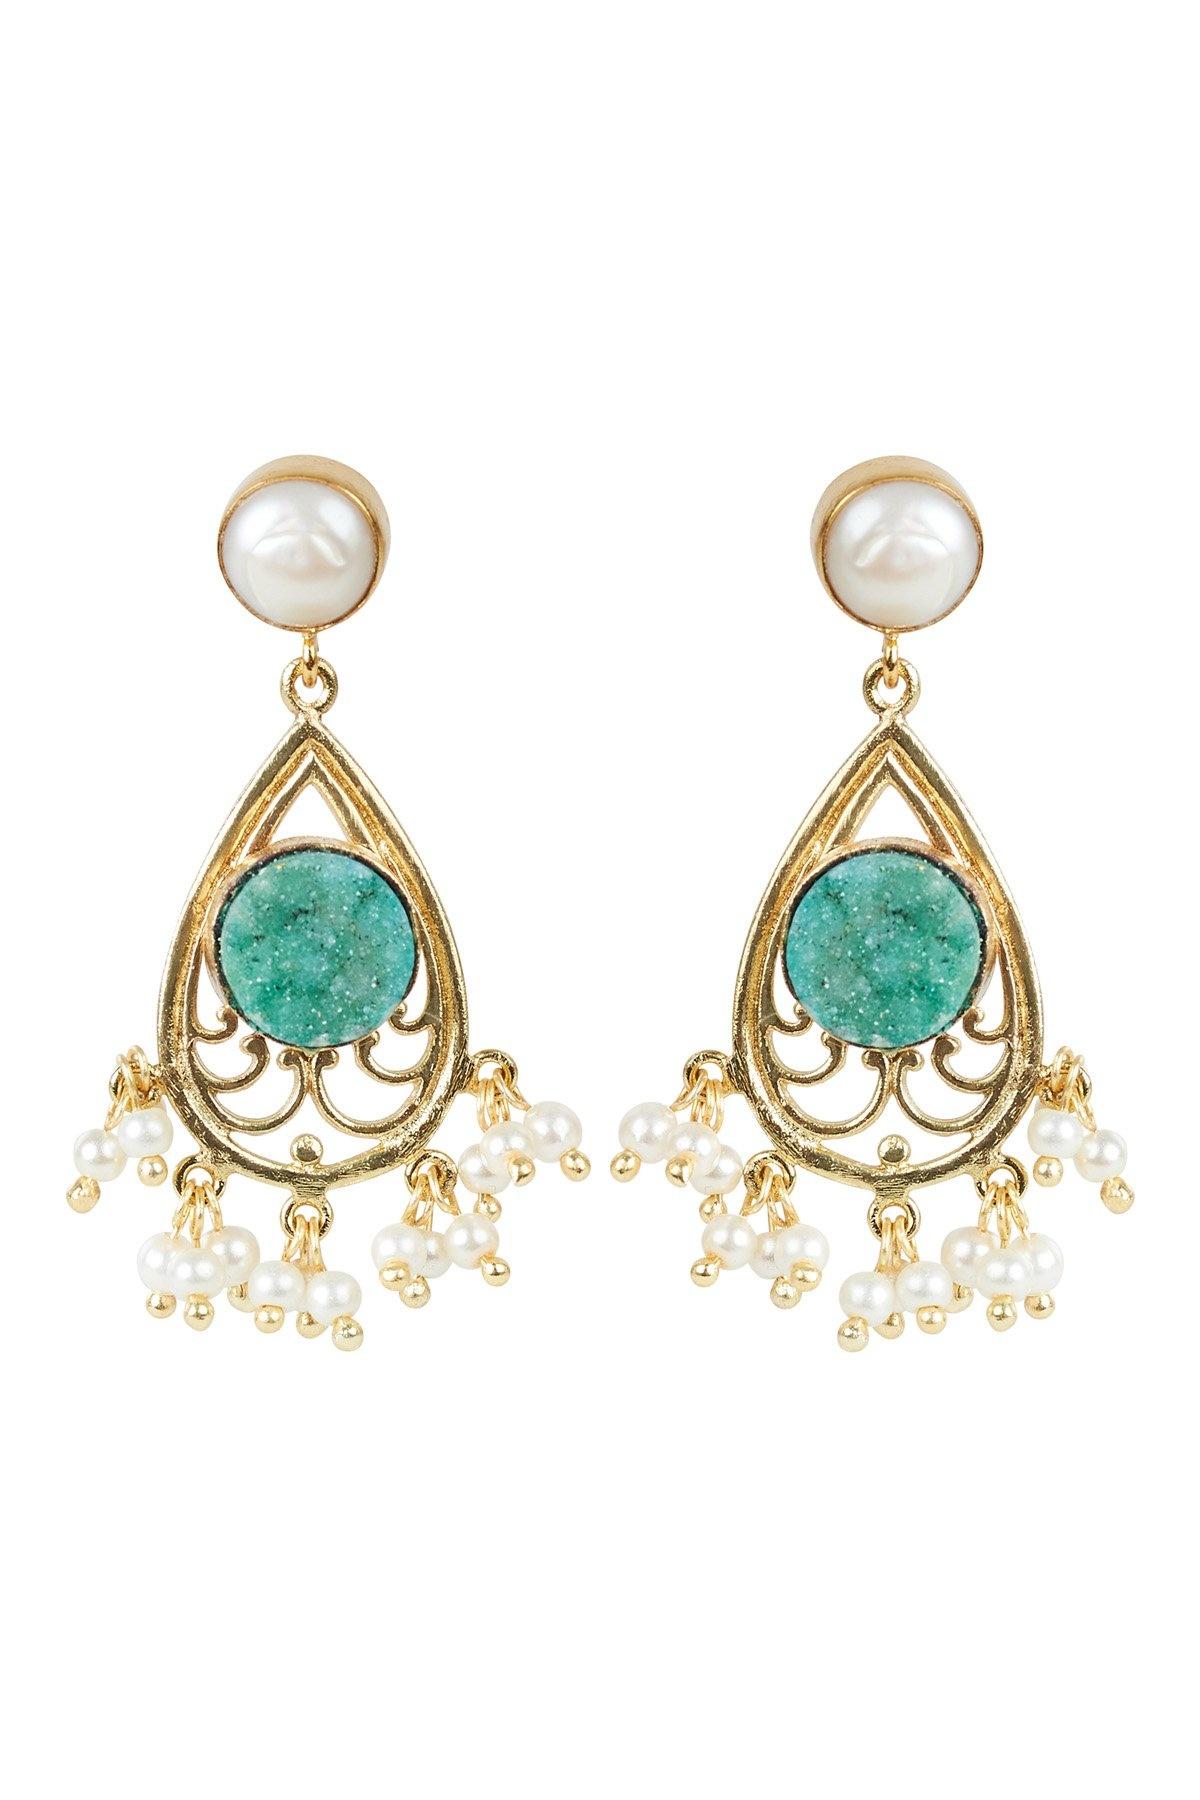 Eb & Ive Lustre Earring